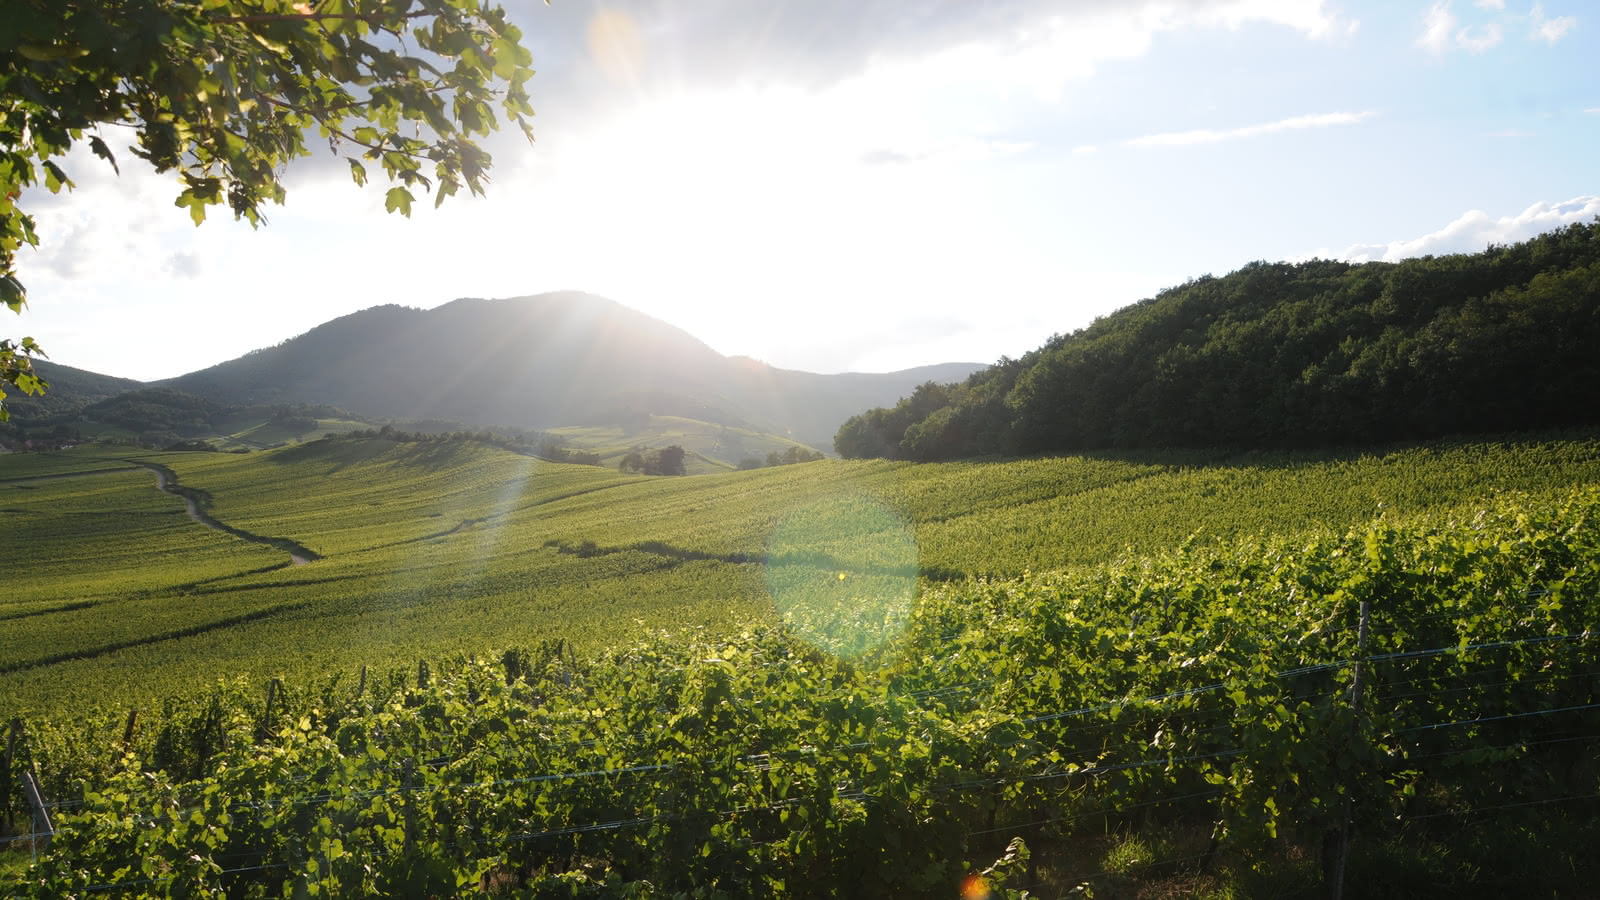 Dîner au cœur du vignoble